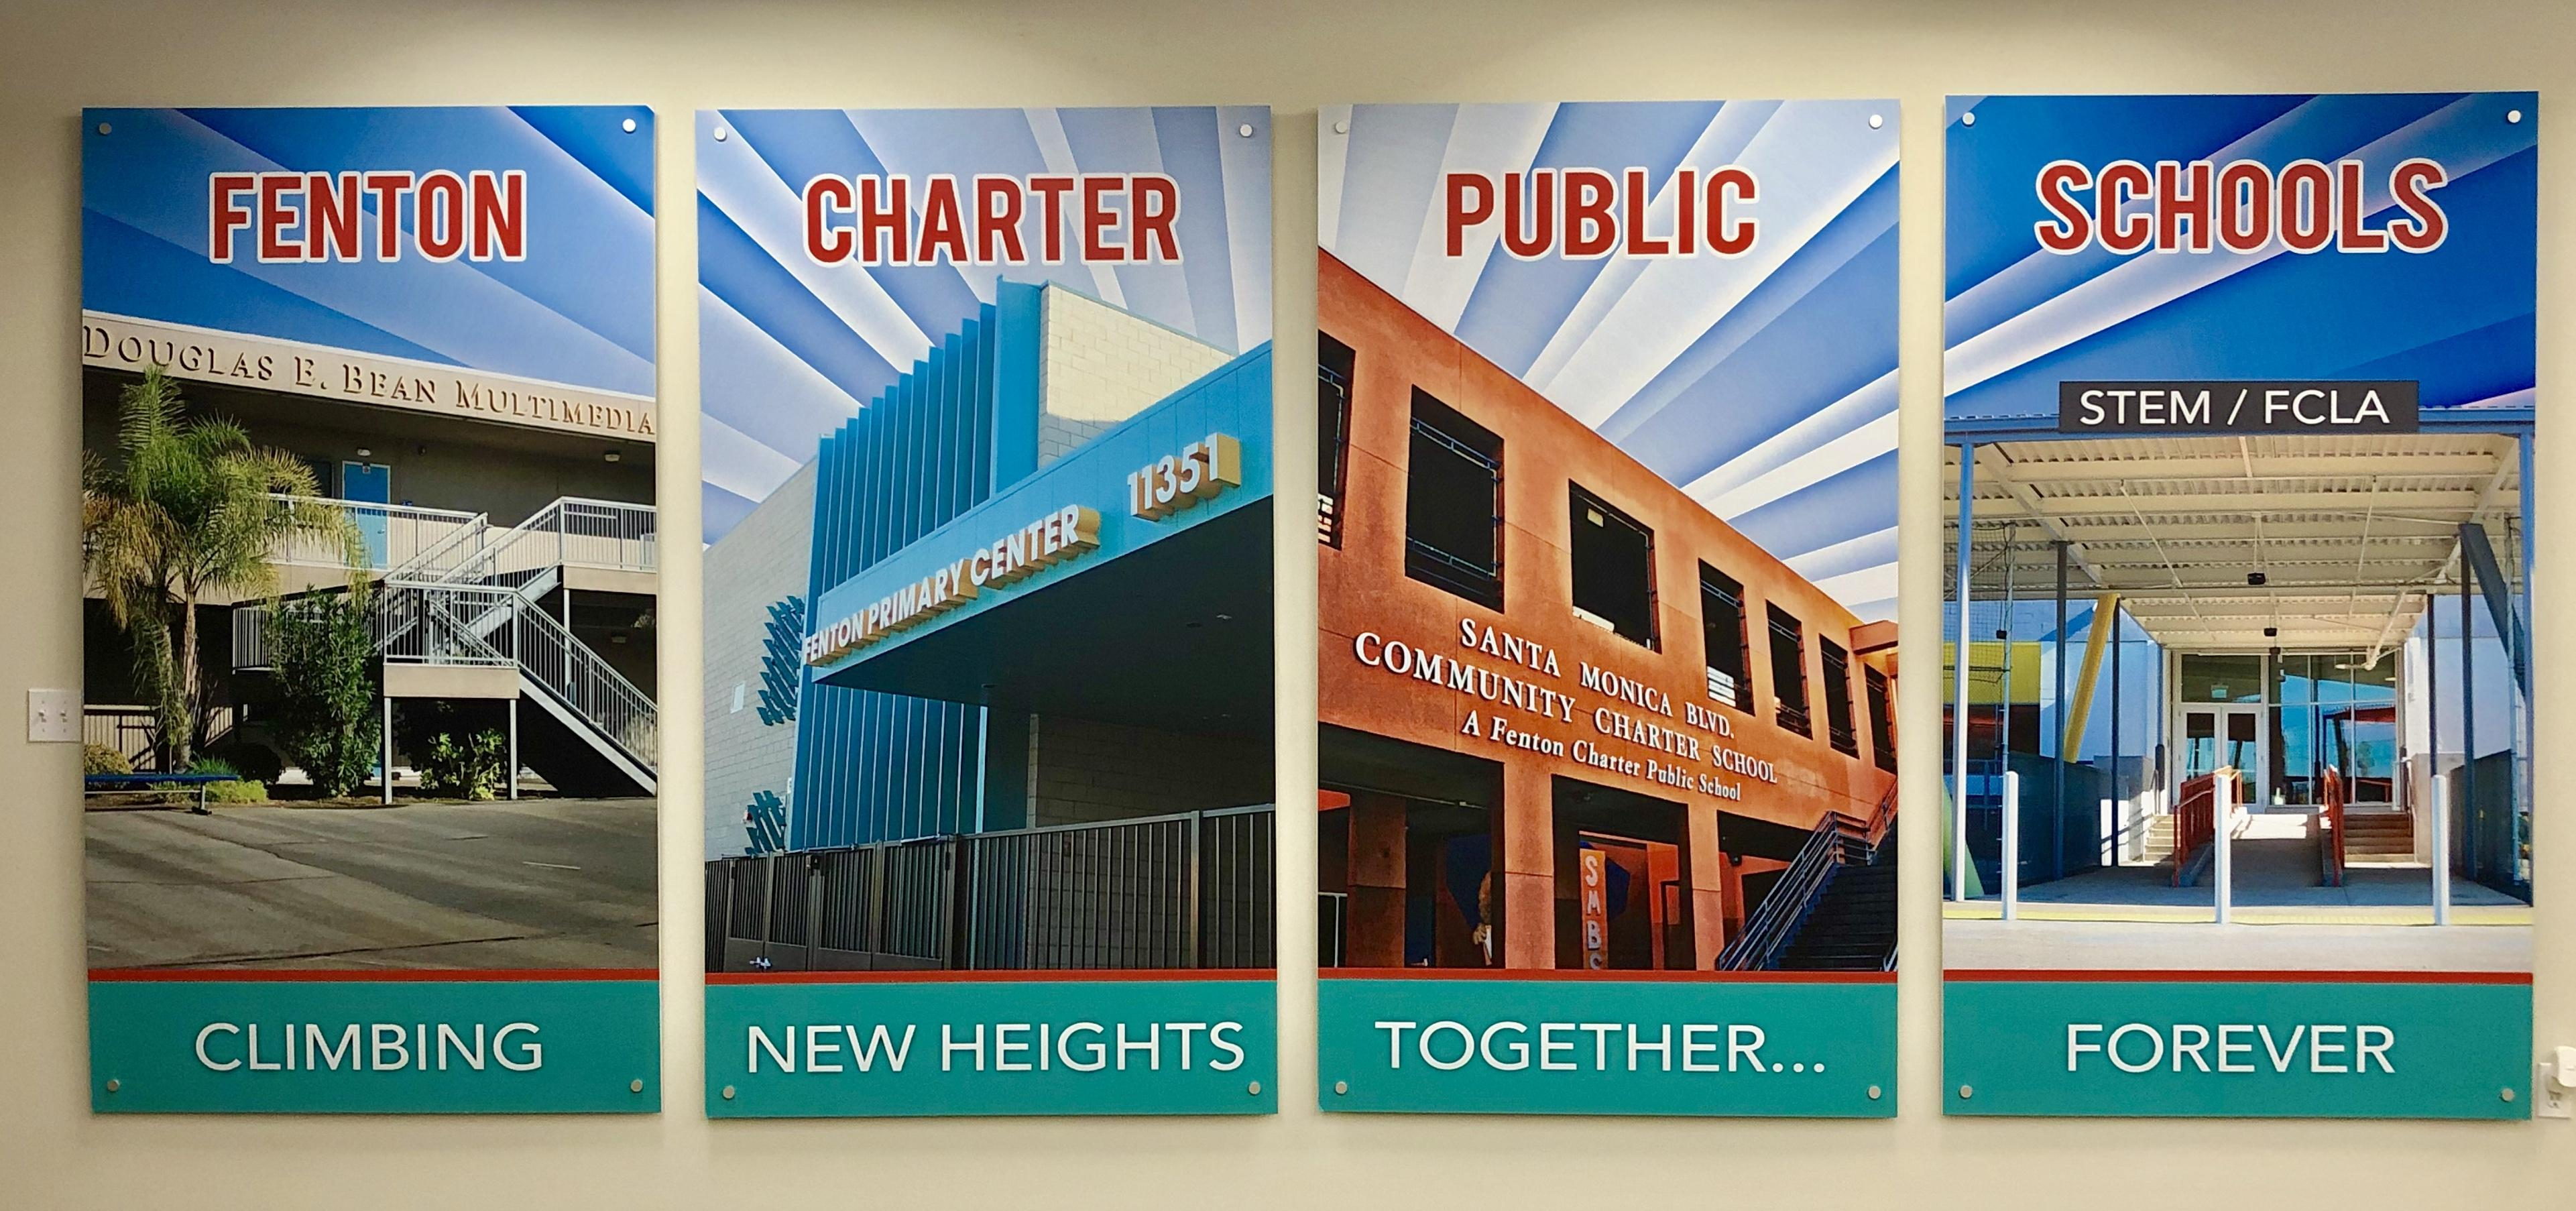 Board Agenda – FCPS Board – Fenton Charter Public Schools